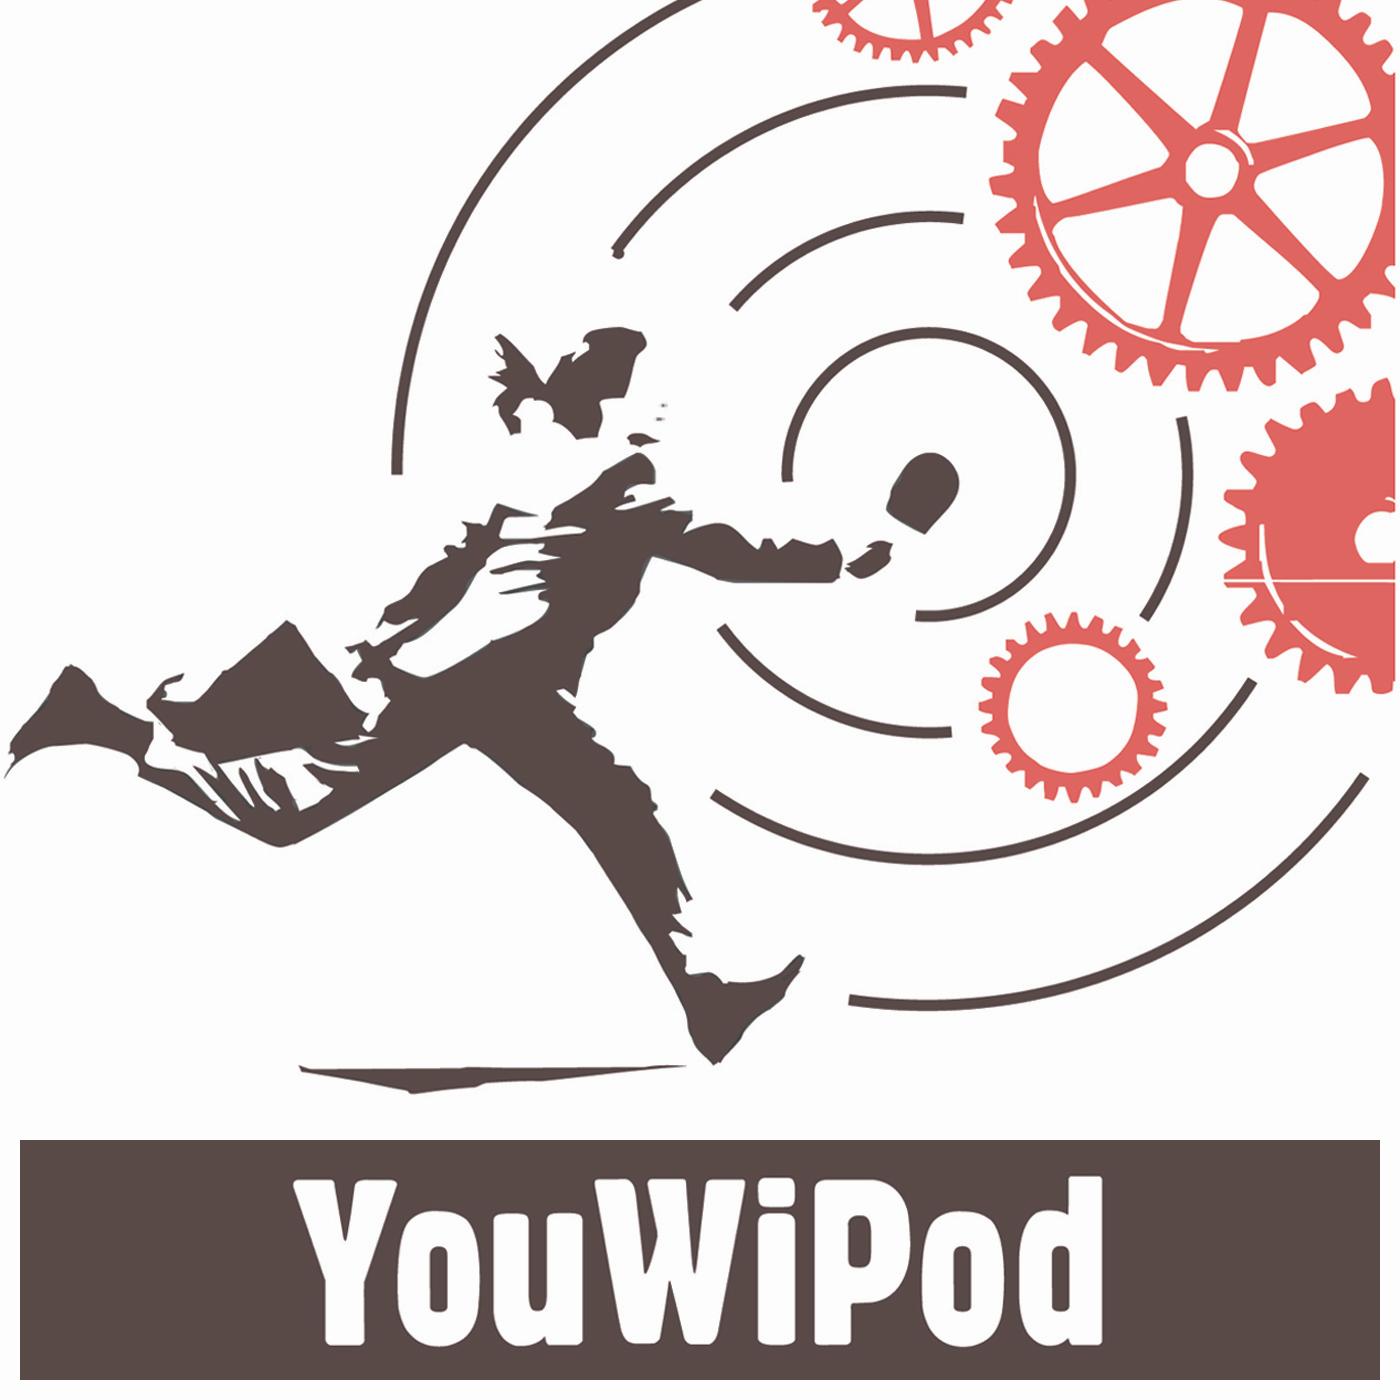 YouWiPod: Jugend, Wirtschaft, Podcast